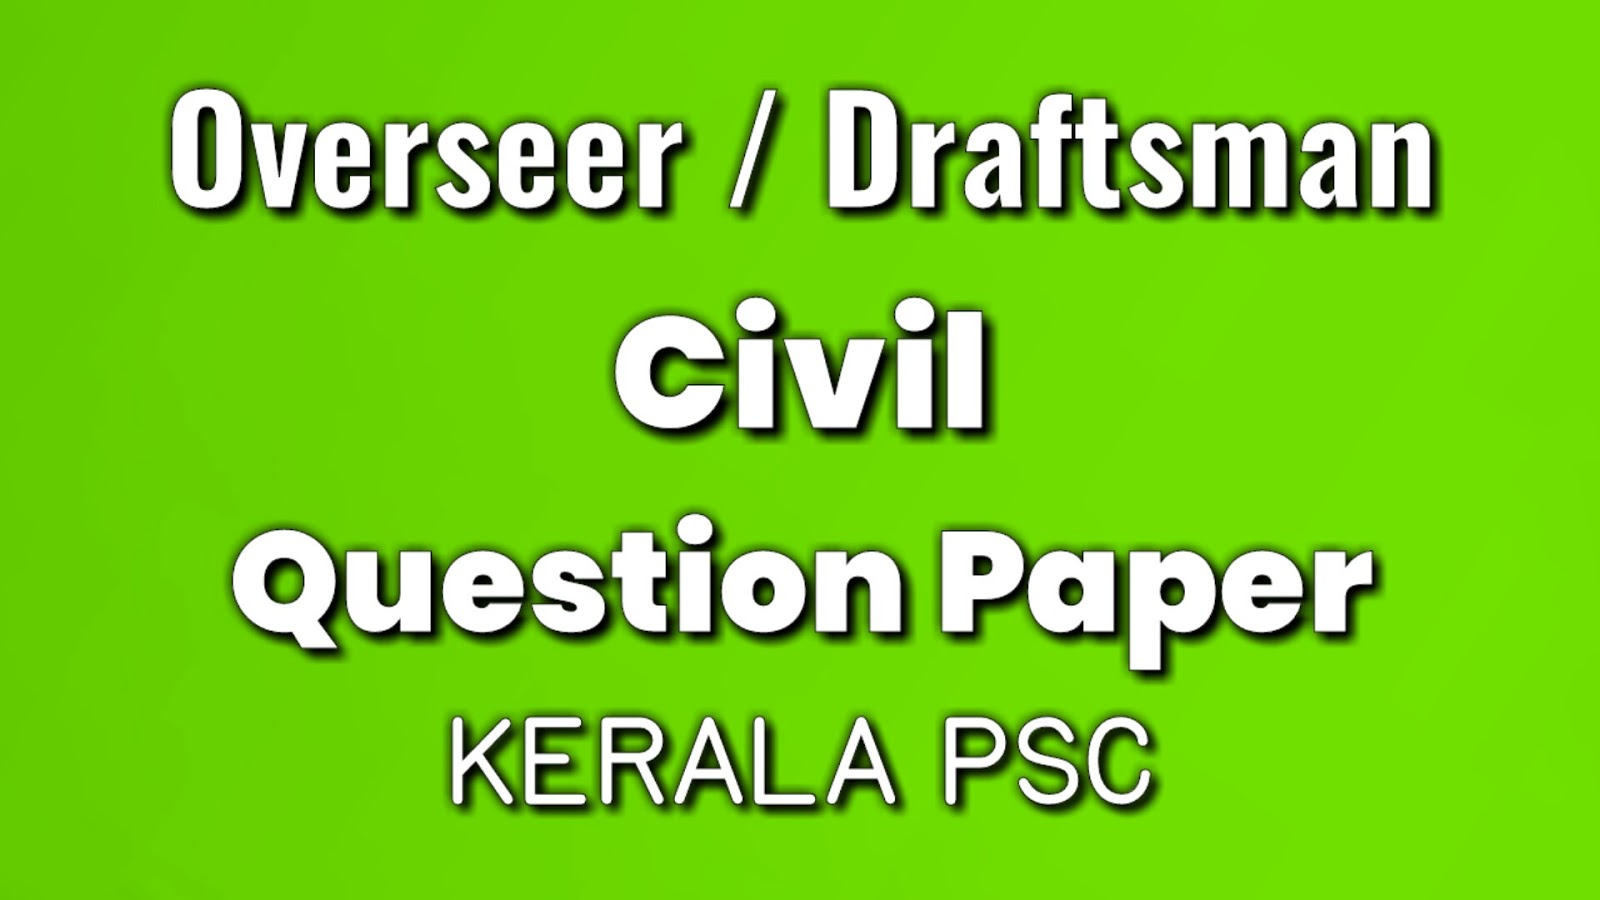 Kerala PSC Overseer Civil / Draftsman Civil ( Harbour Engineering ) Previous Question Paper